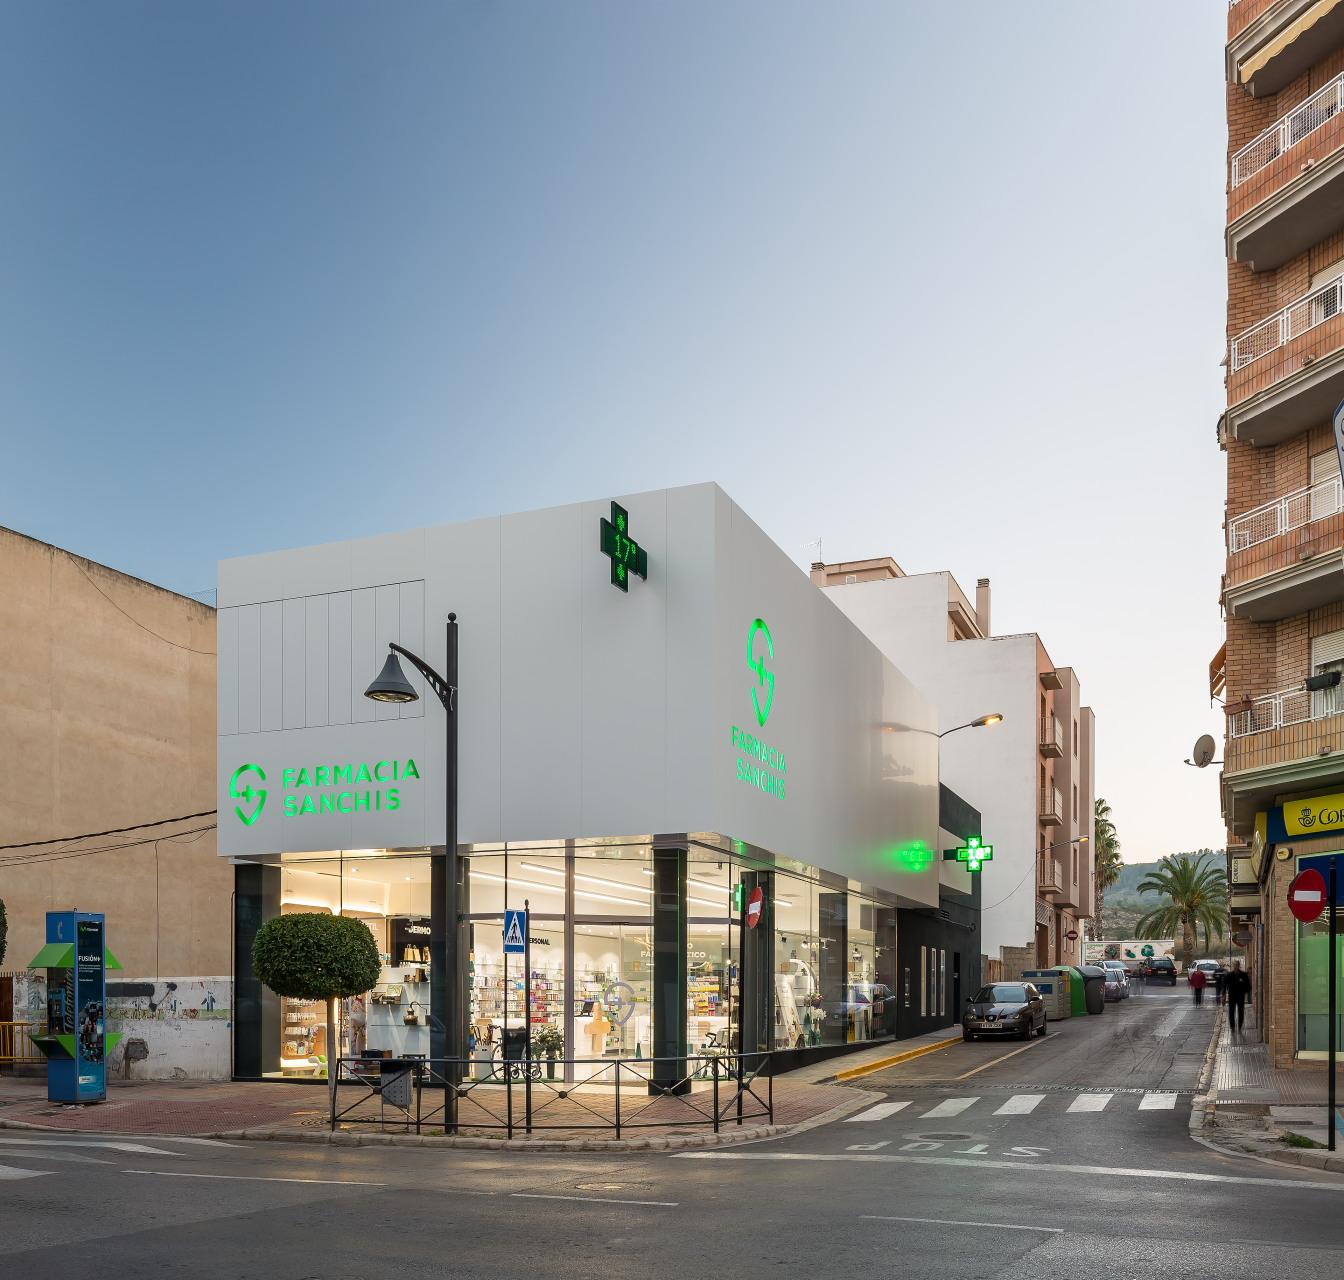 fotografia-arquitectura-valencia-german-cabo-d'estudio-farmacia-sanchis-ribarroja (32)